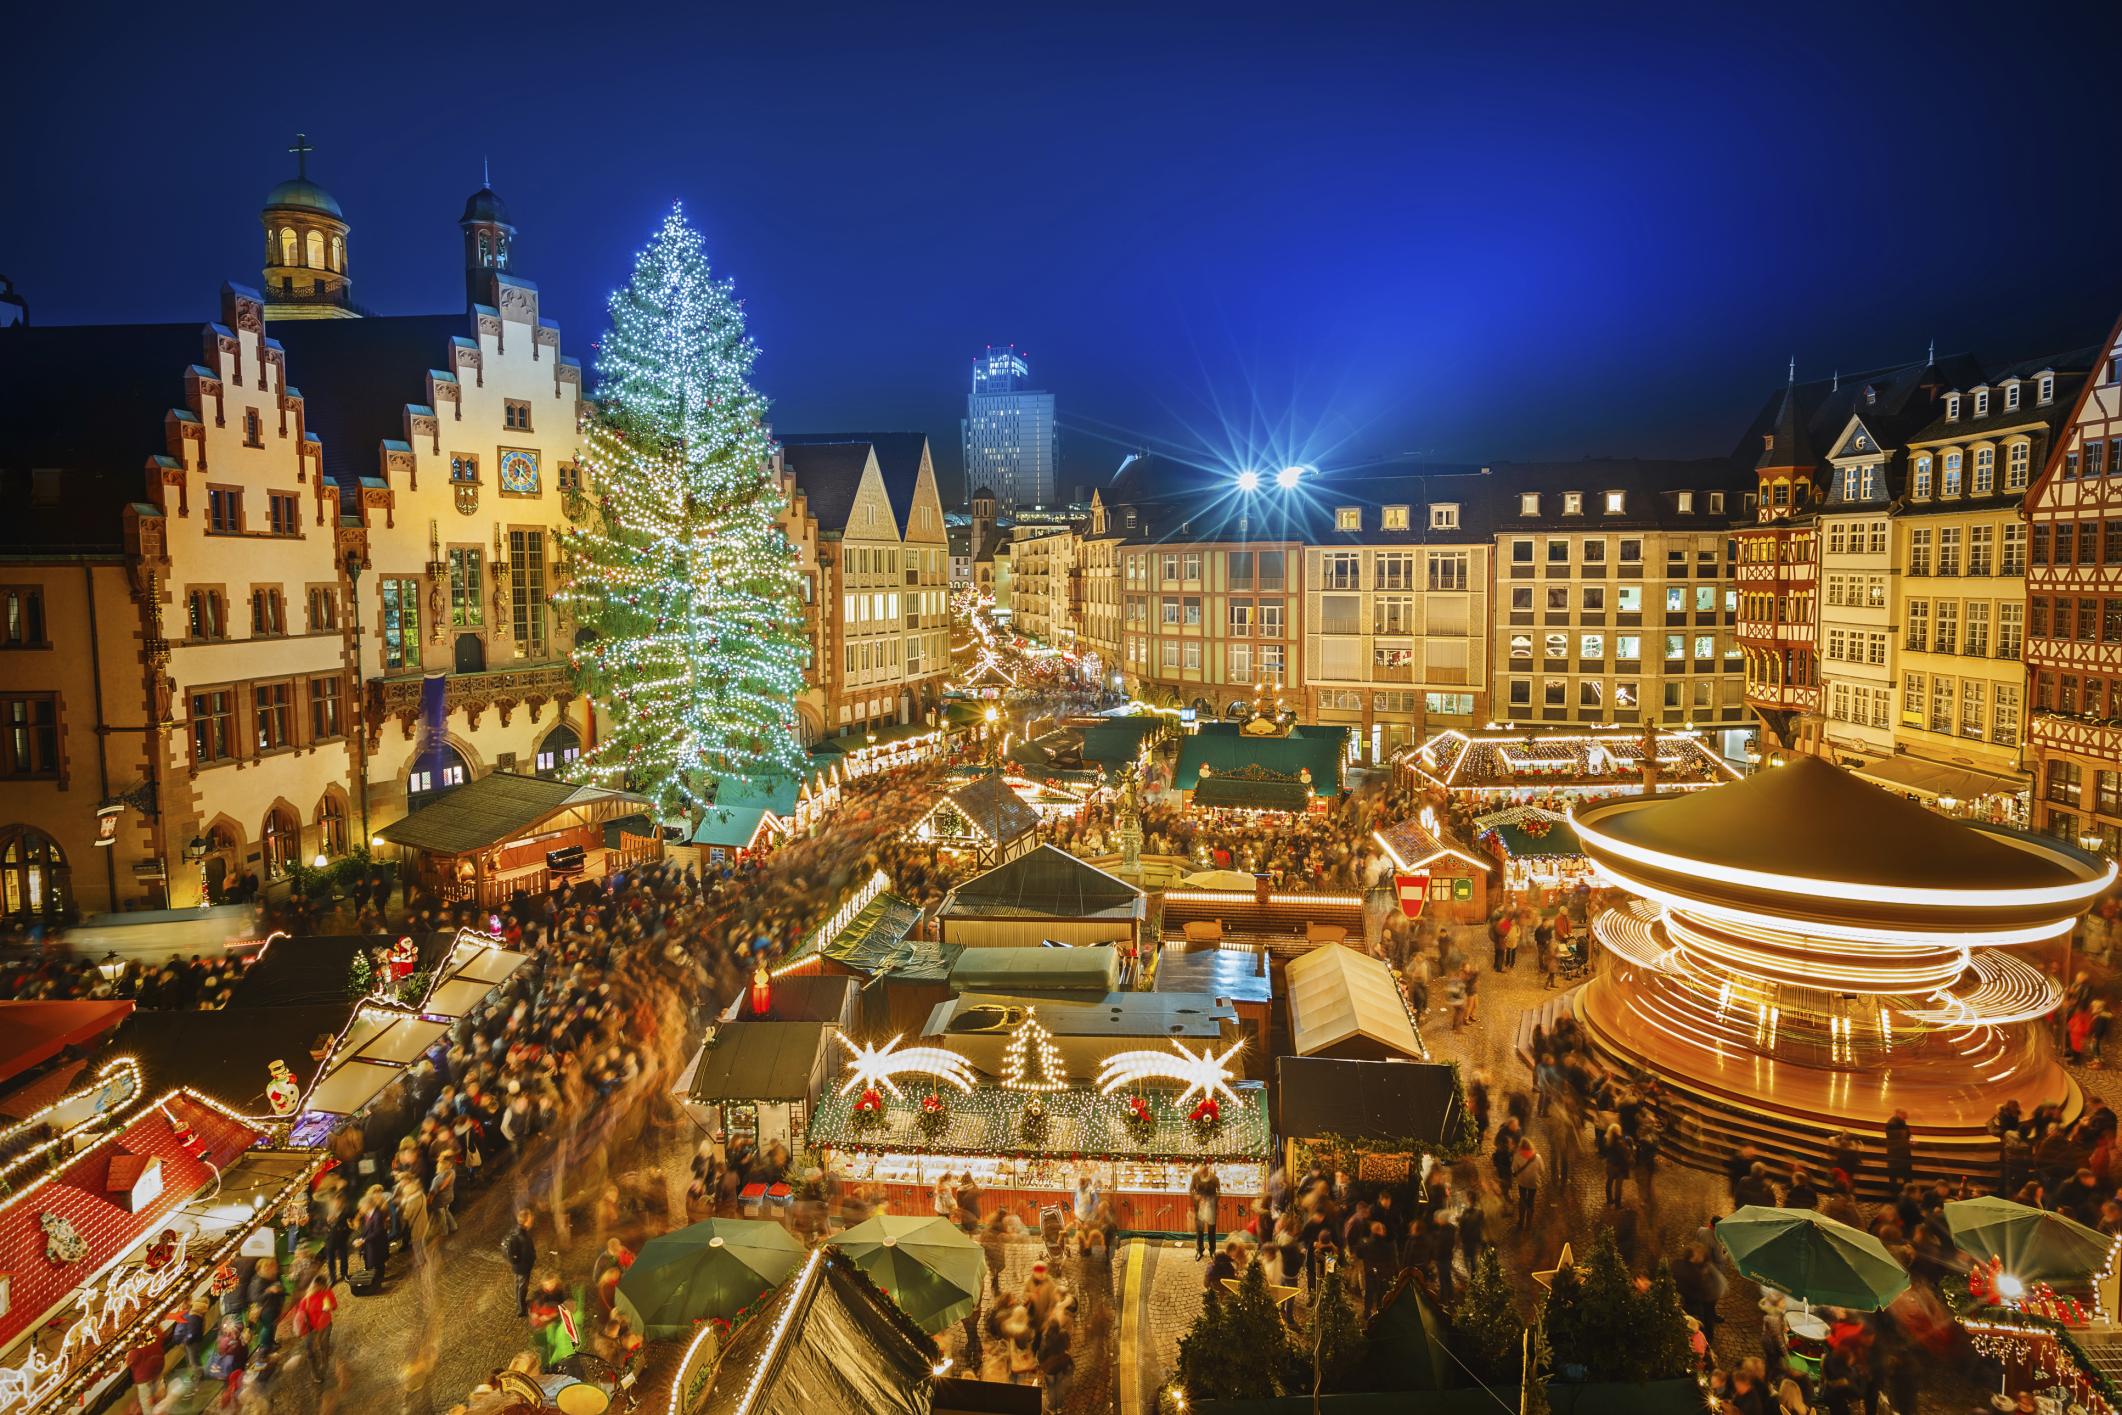 The Strasbourg Christmas Market